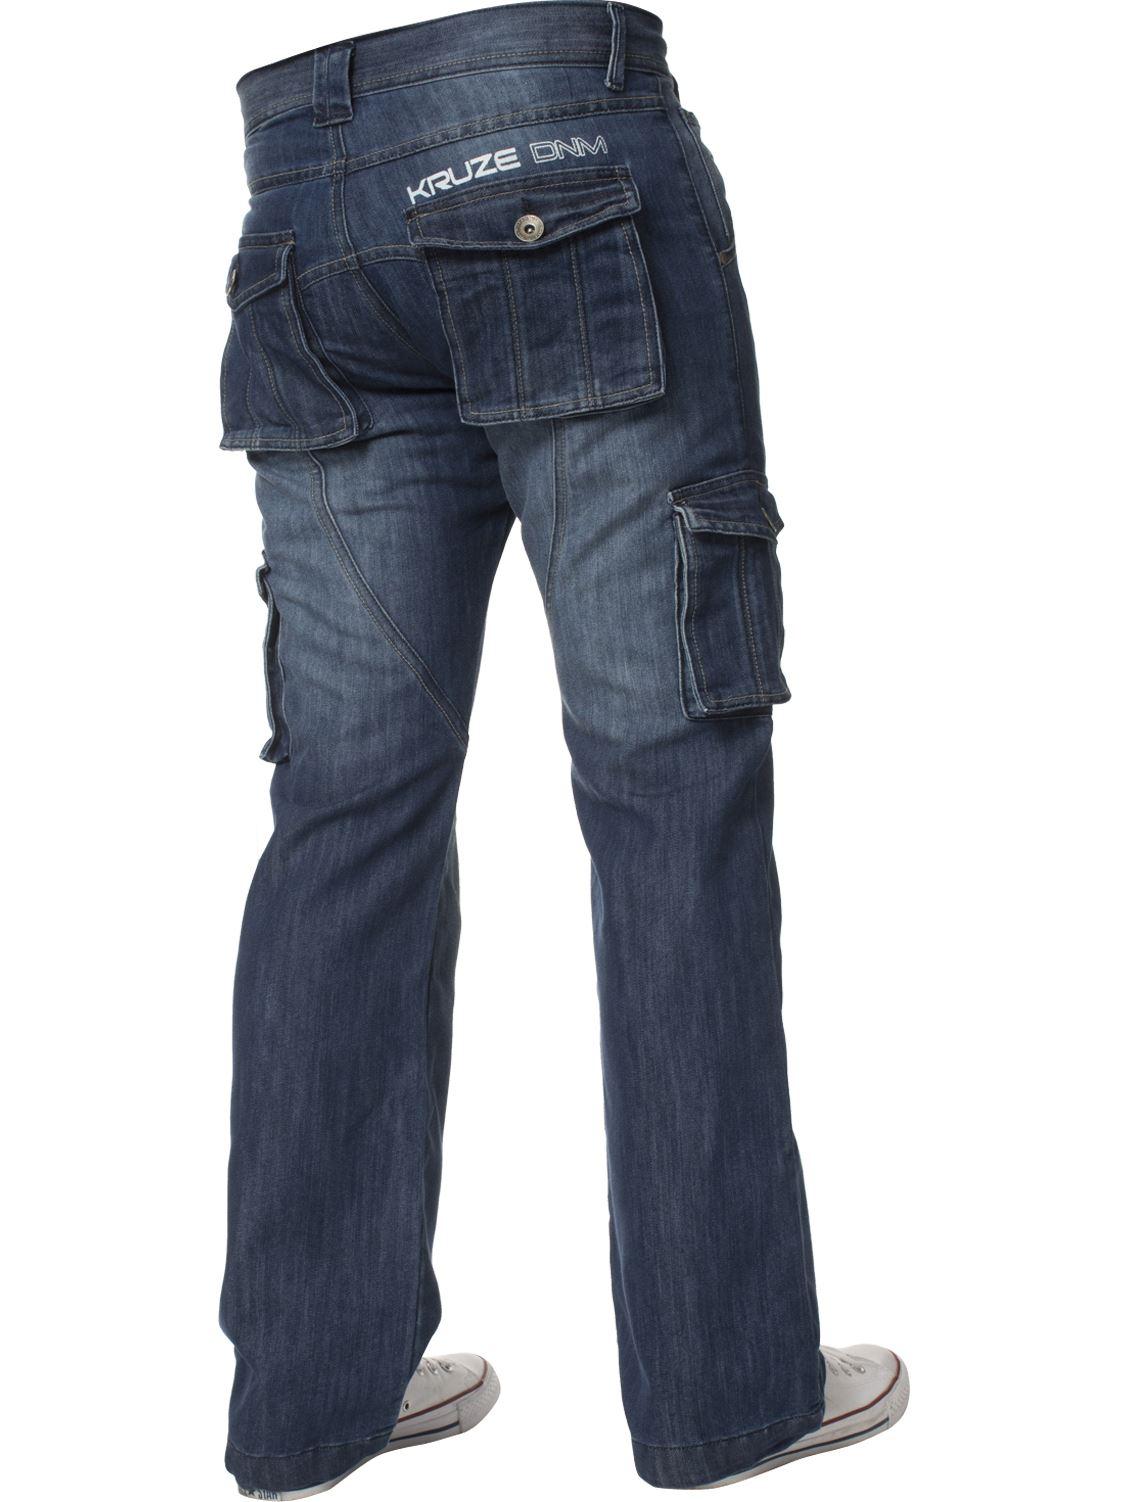 Mens-Jeans-Combate-Carga-Informal-Kruze-Trabajo-Pantalones-Cintura-Tallas-Denim-Pantalones-de-vestir miniatura 15